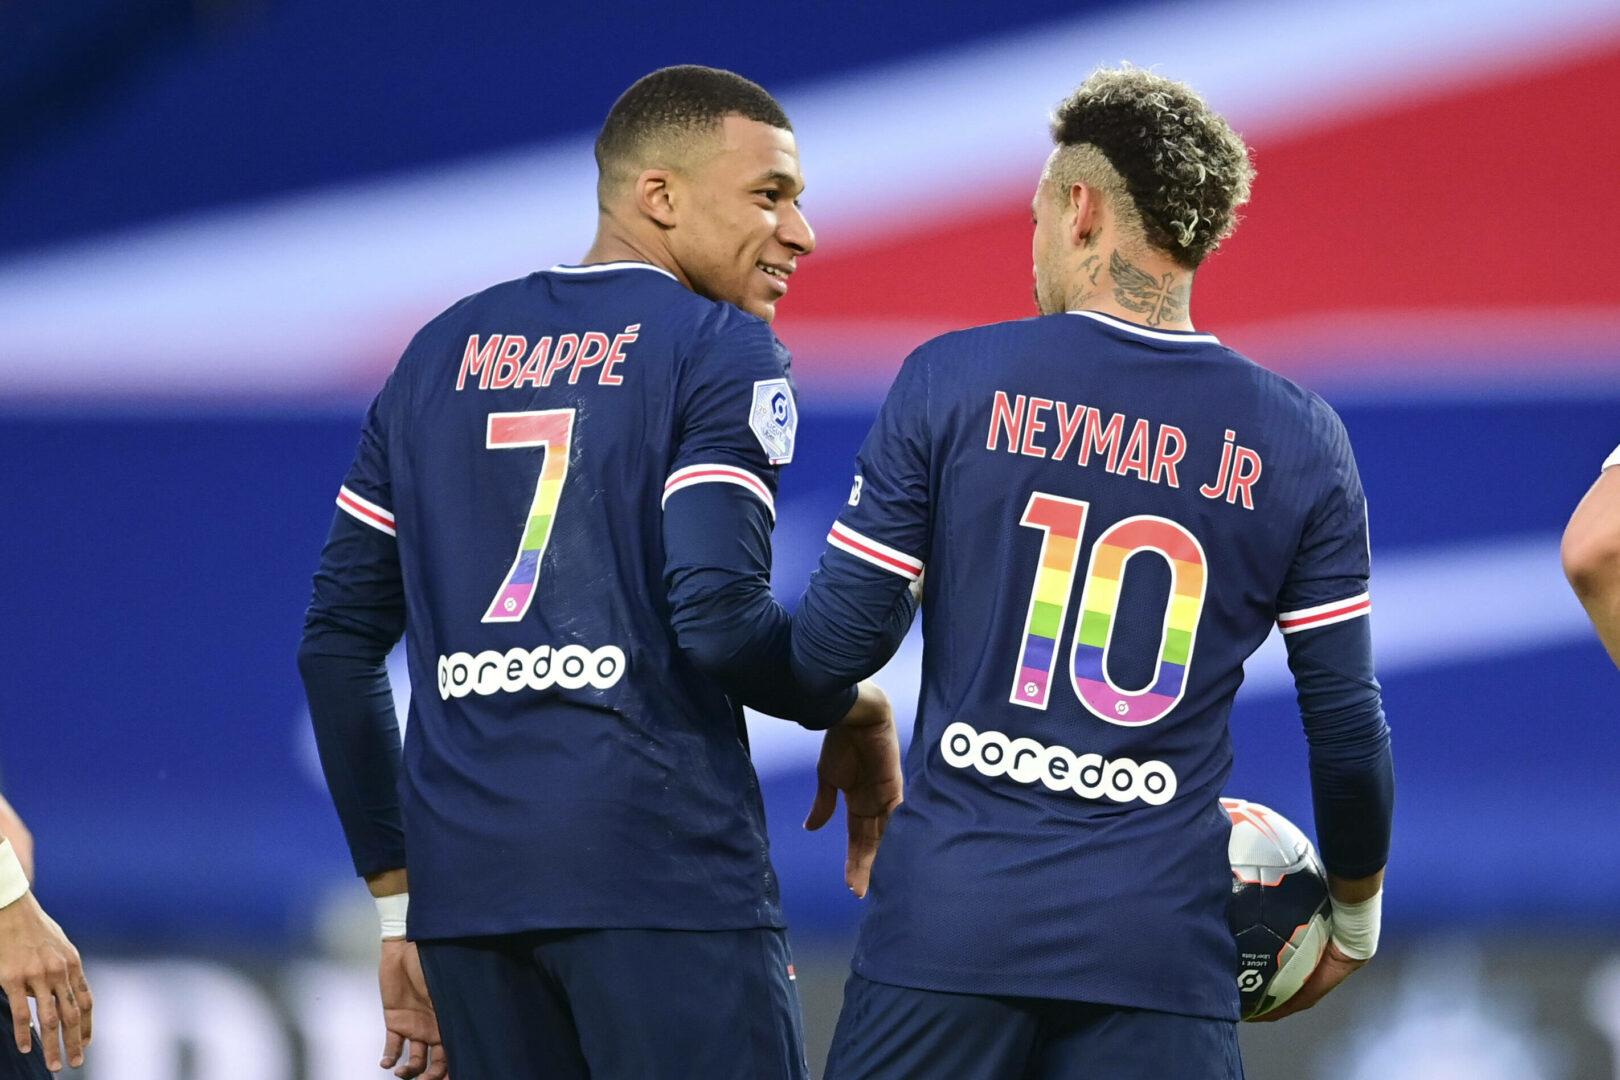 Vorschau Ligue 1 – Teil 4: PSG, Montpellier, SCO Angers, Clermont Foot